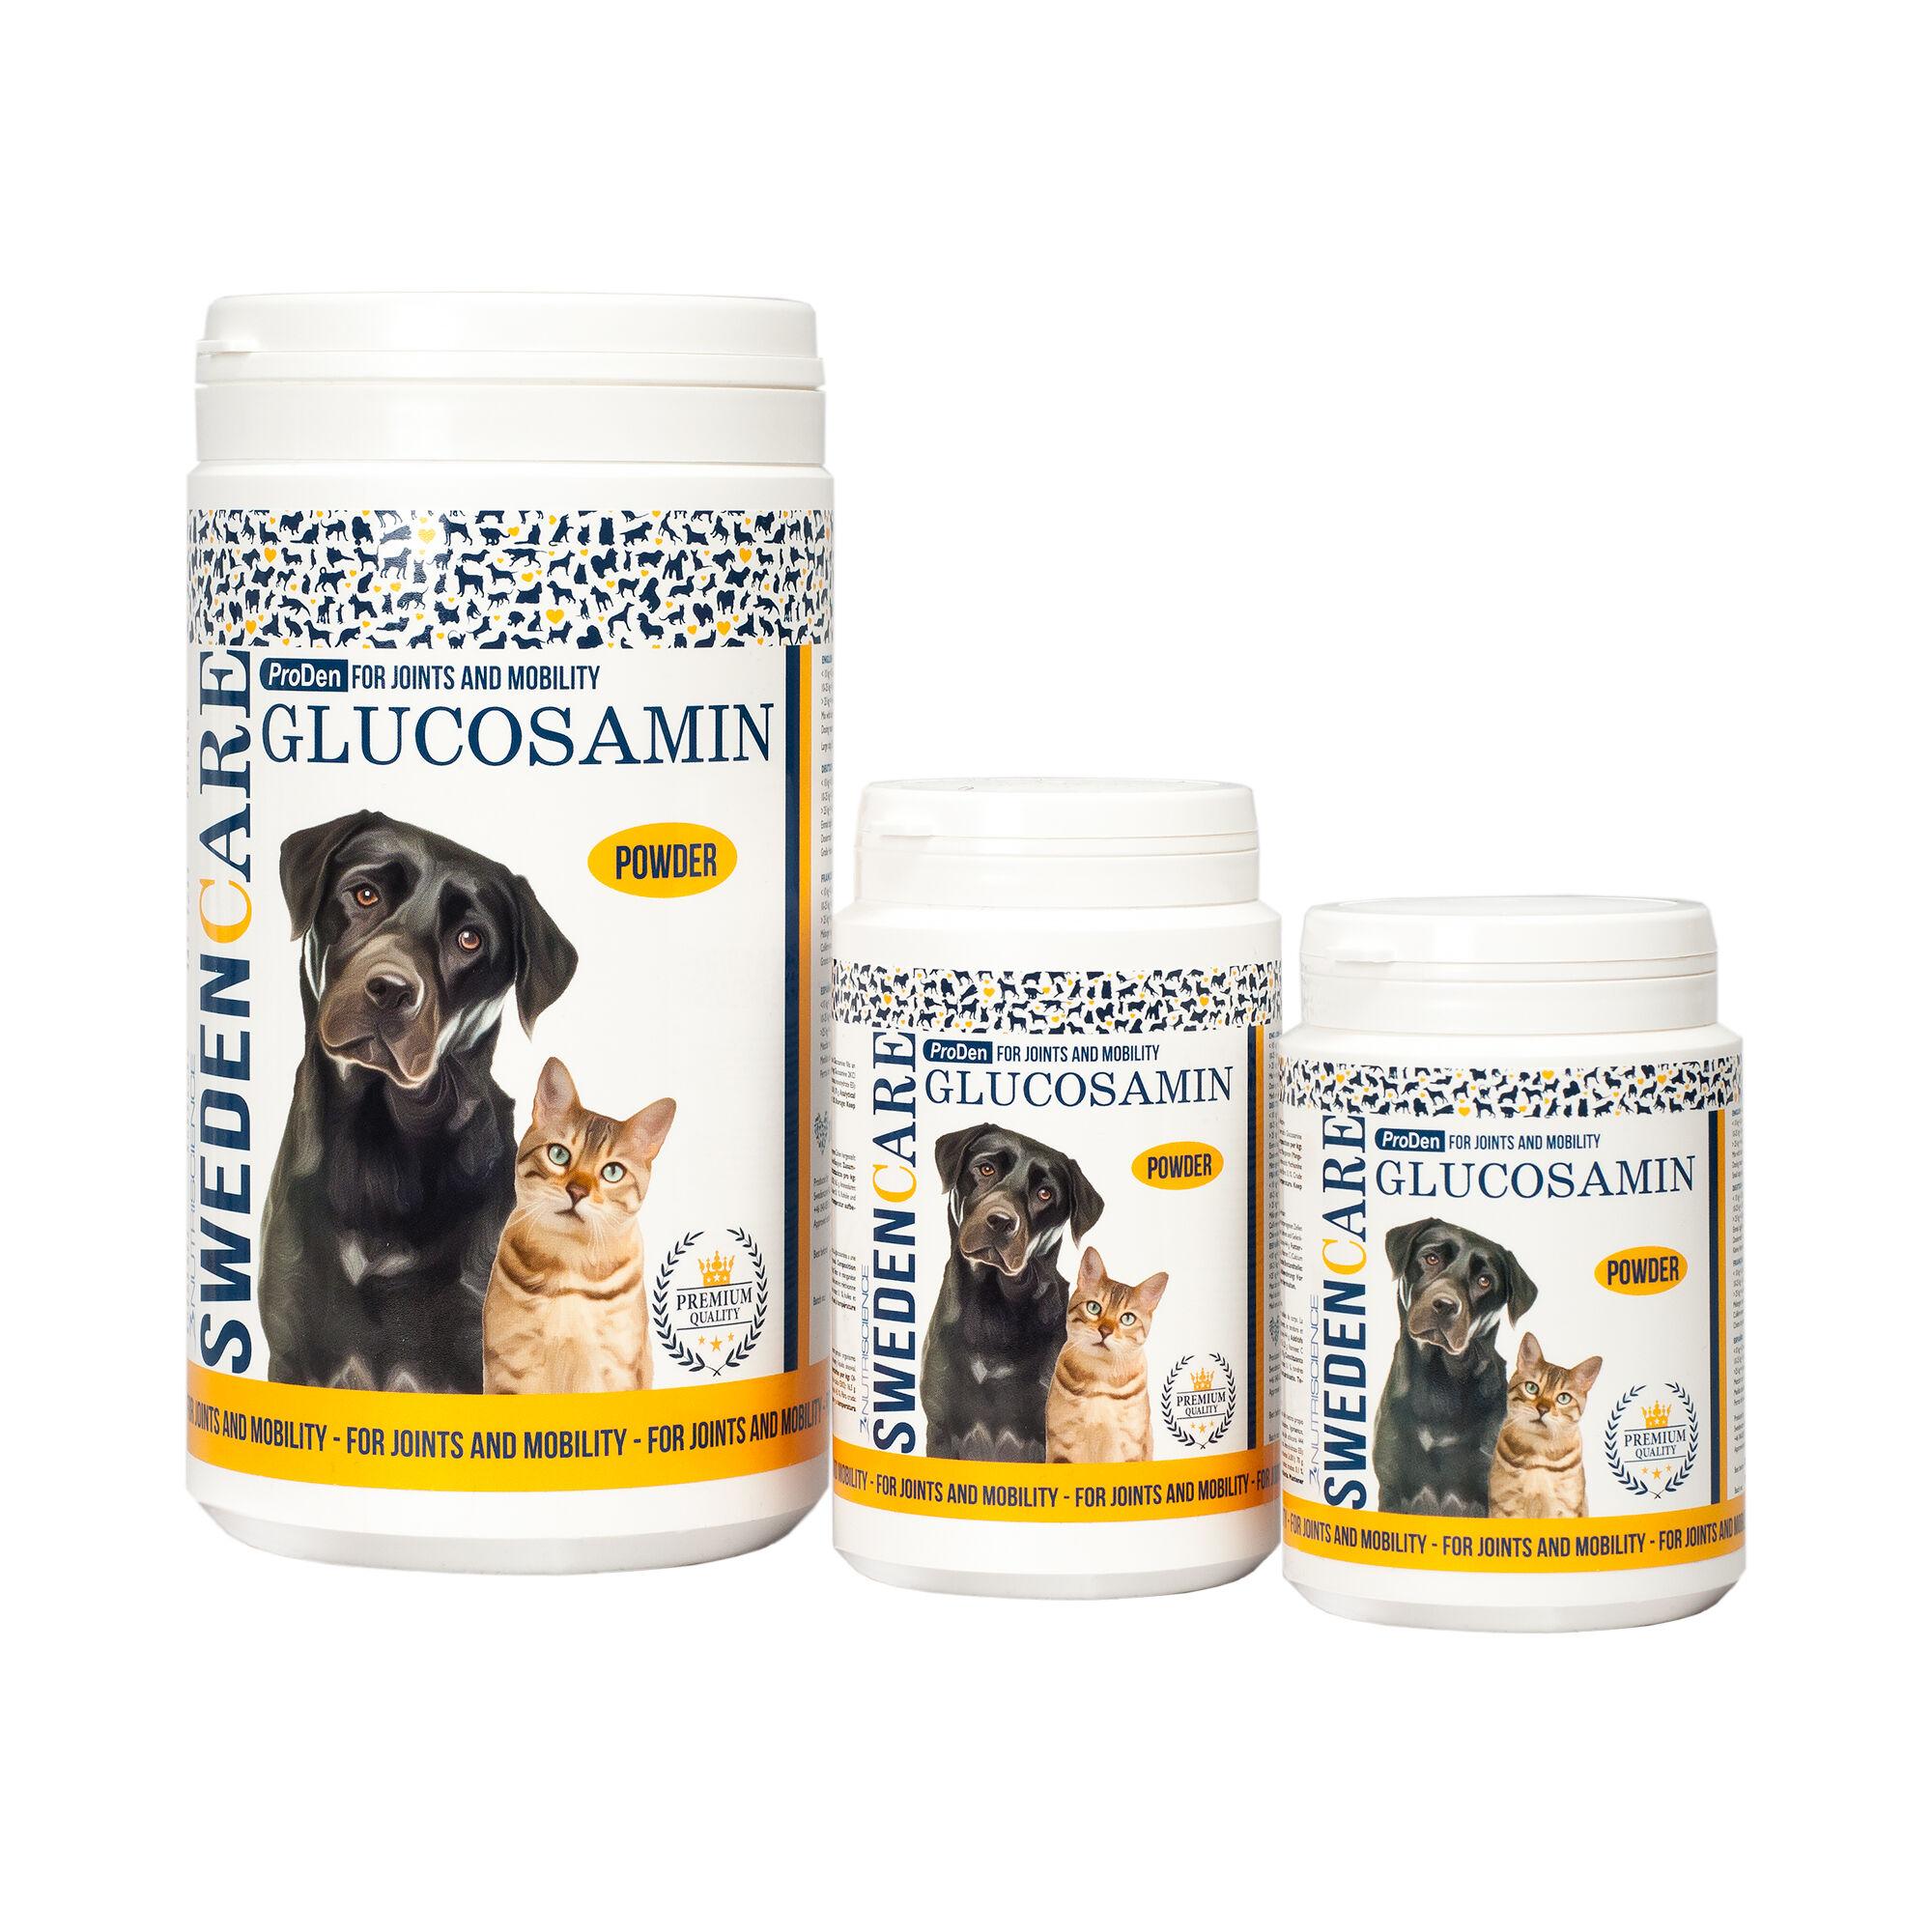 Biopet Swedencare Glucosamin